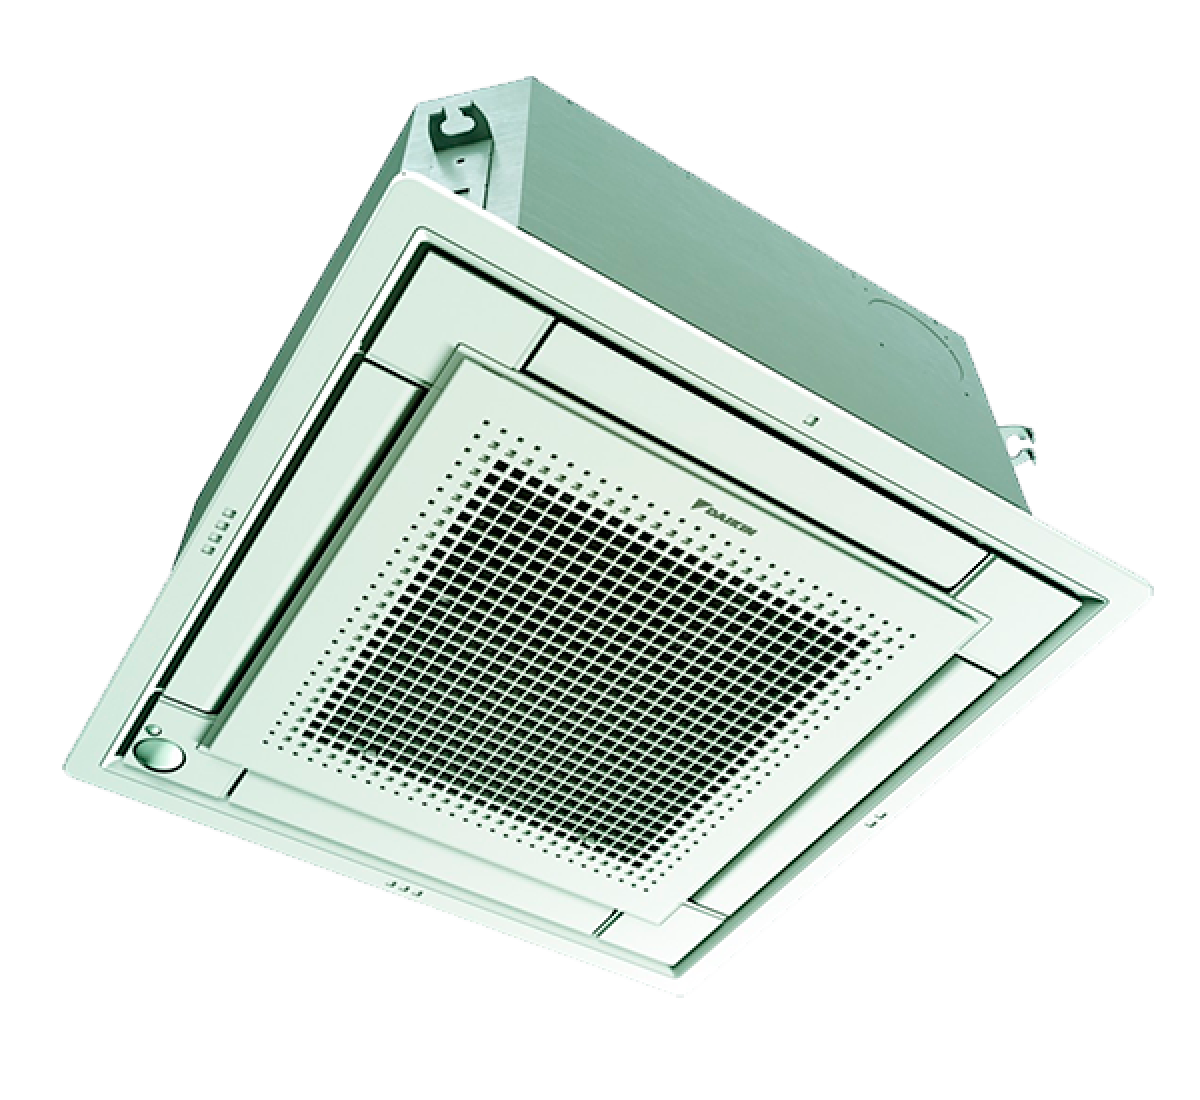 unidad-interior-de-cassette-integrado-daikin-serie-sky-air-advance-modelo-ffa60a9